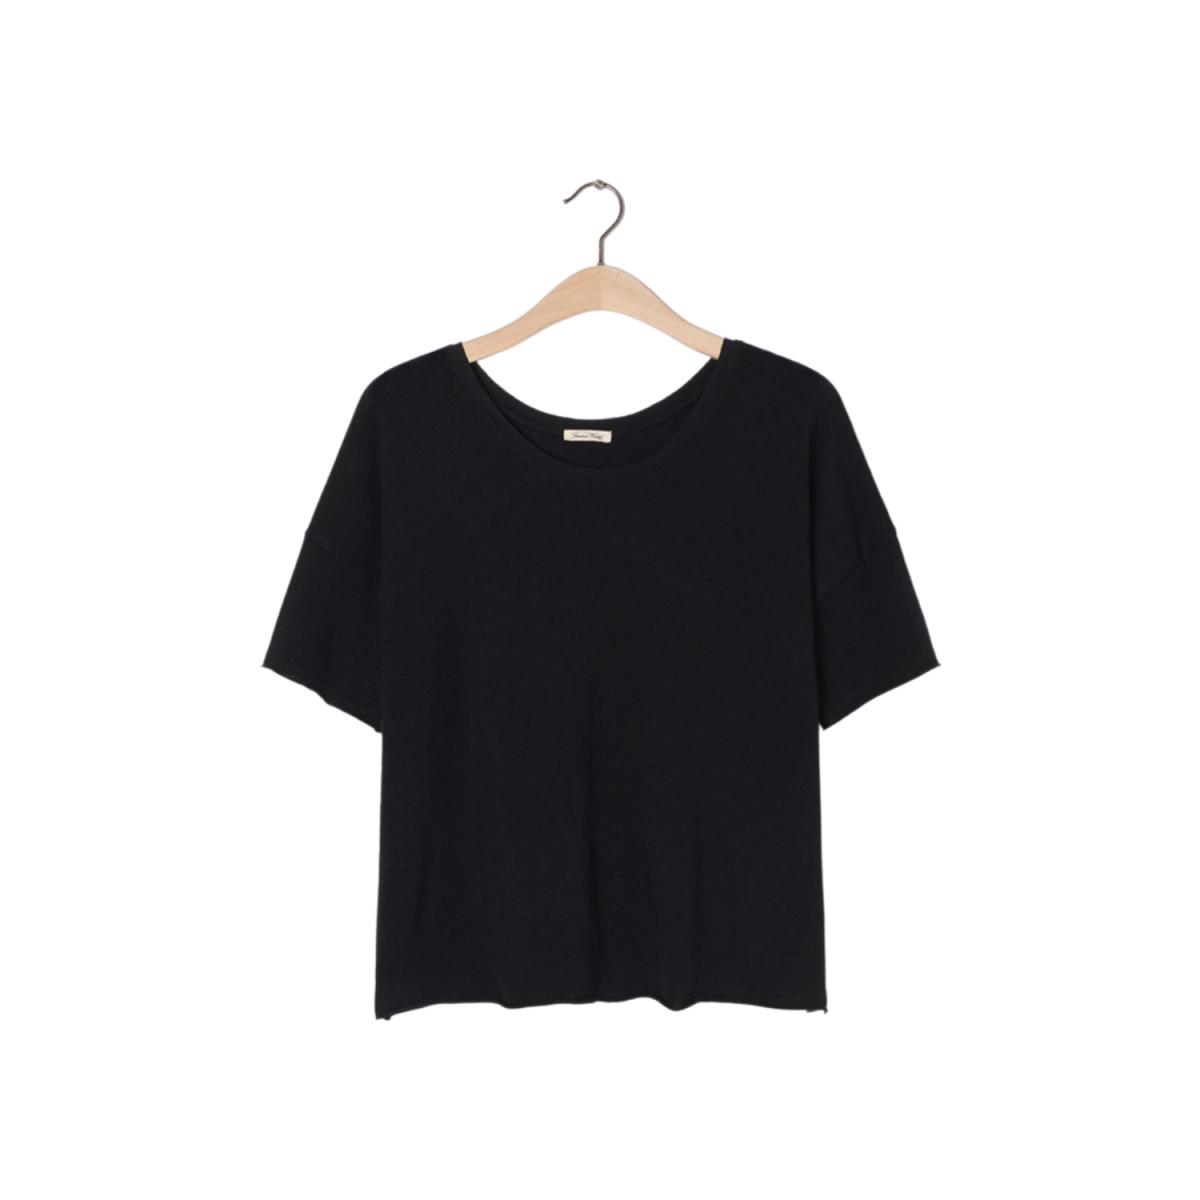 sonoma sweat t-shirt - black